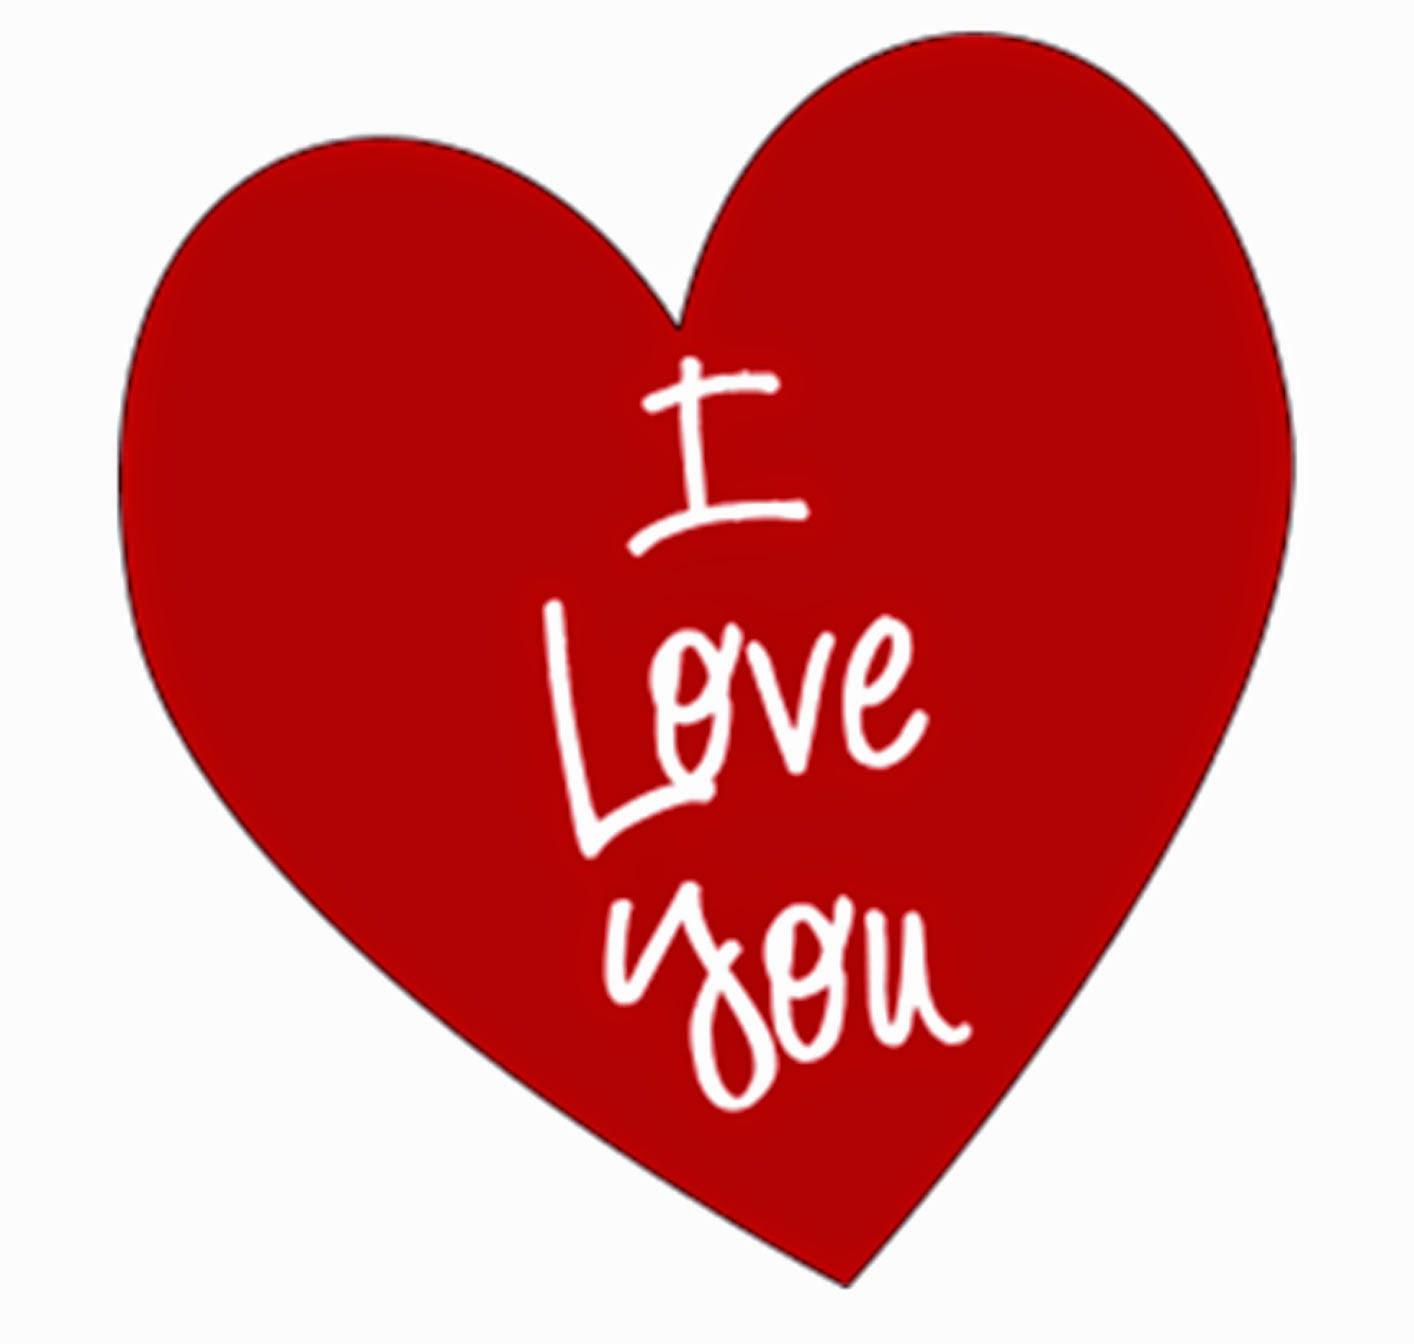 1414x1344 I Love U Clip Art Free Love Clipart Image 0515 1004 3004 3021